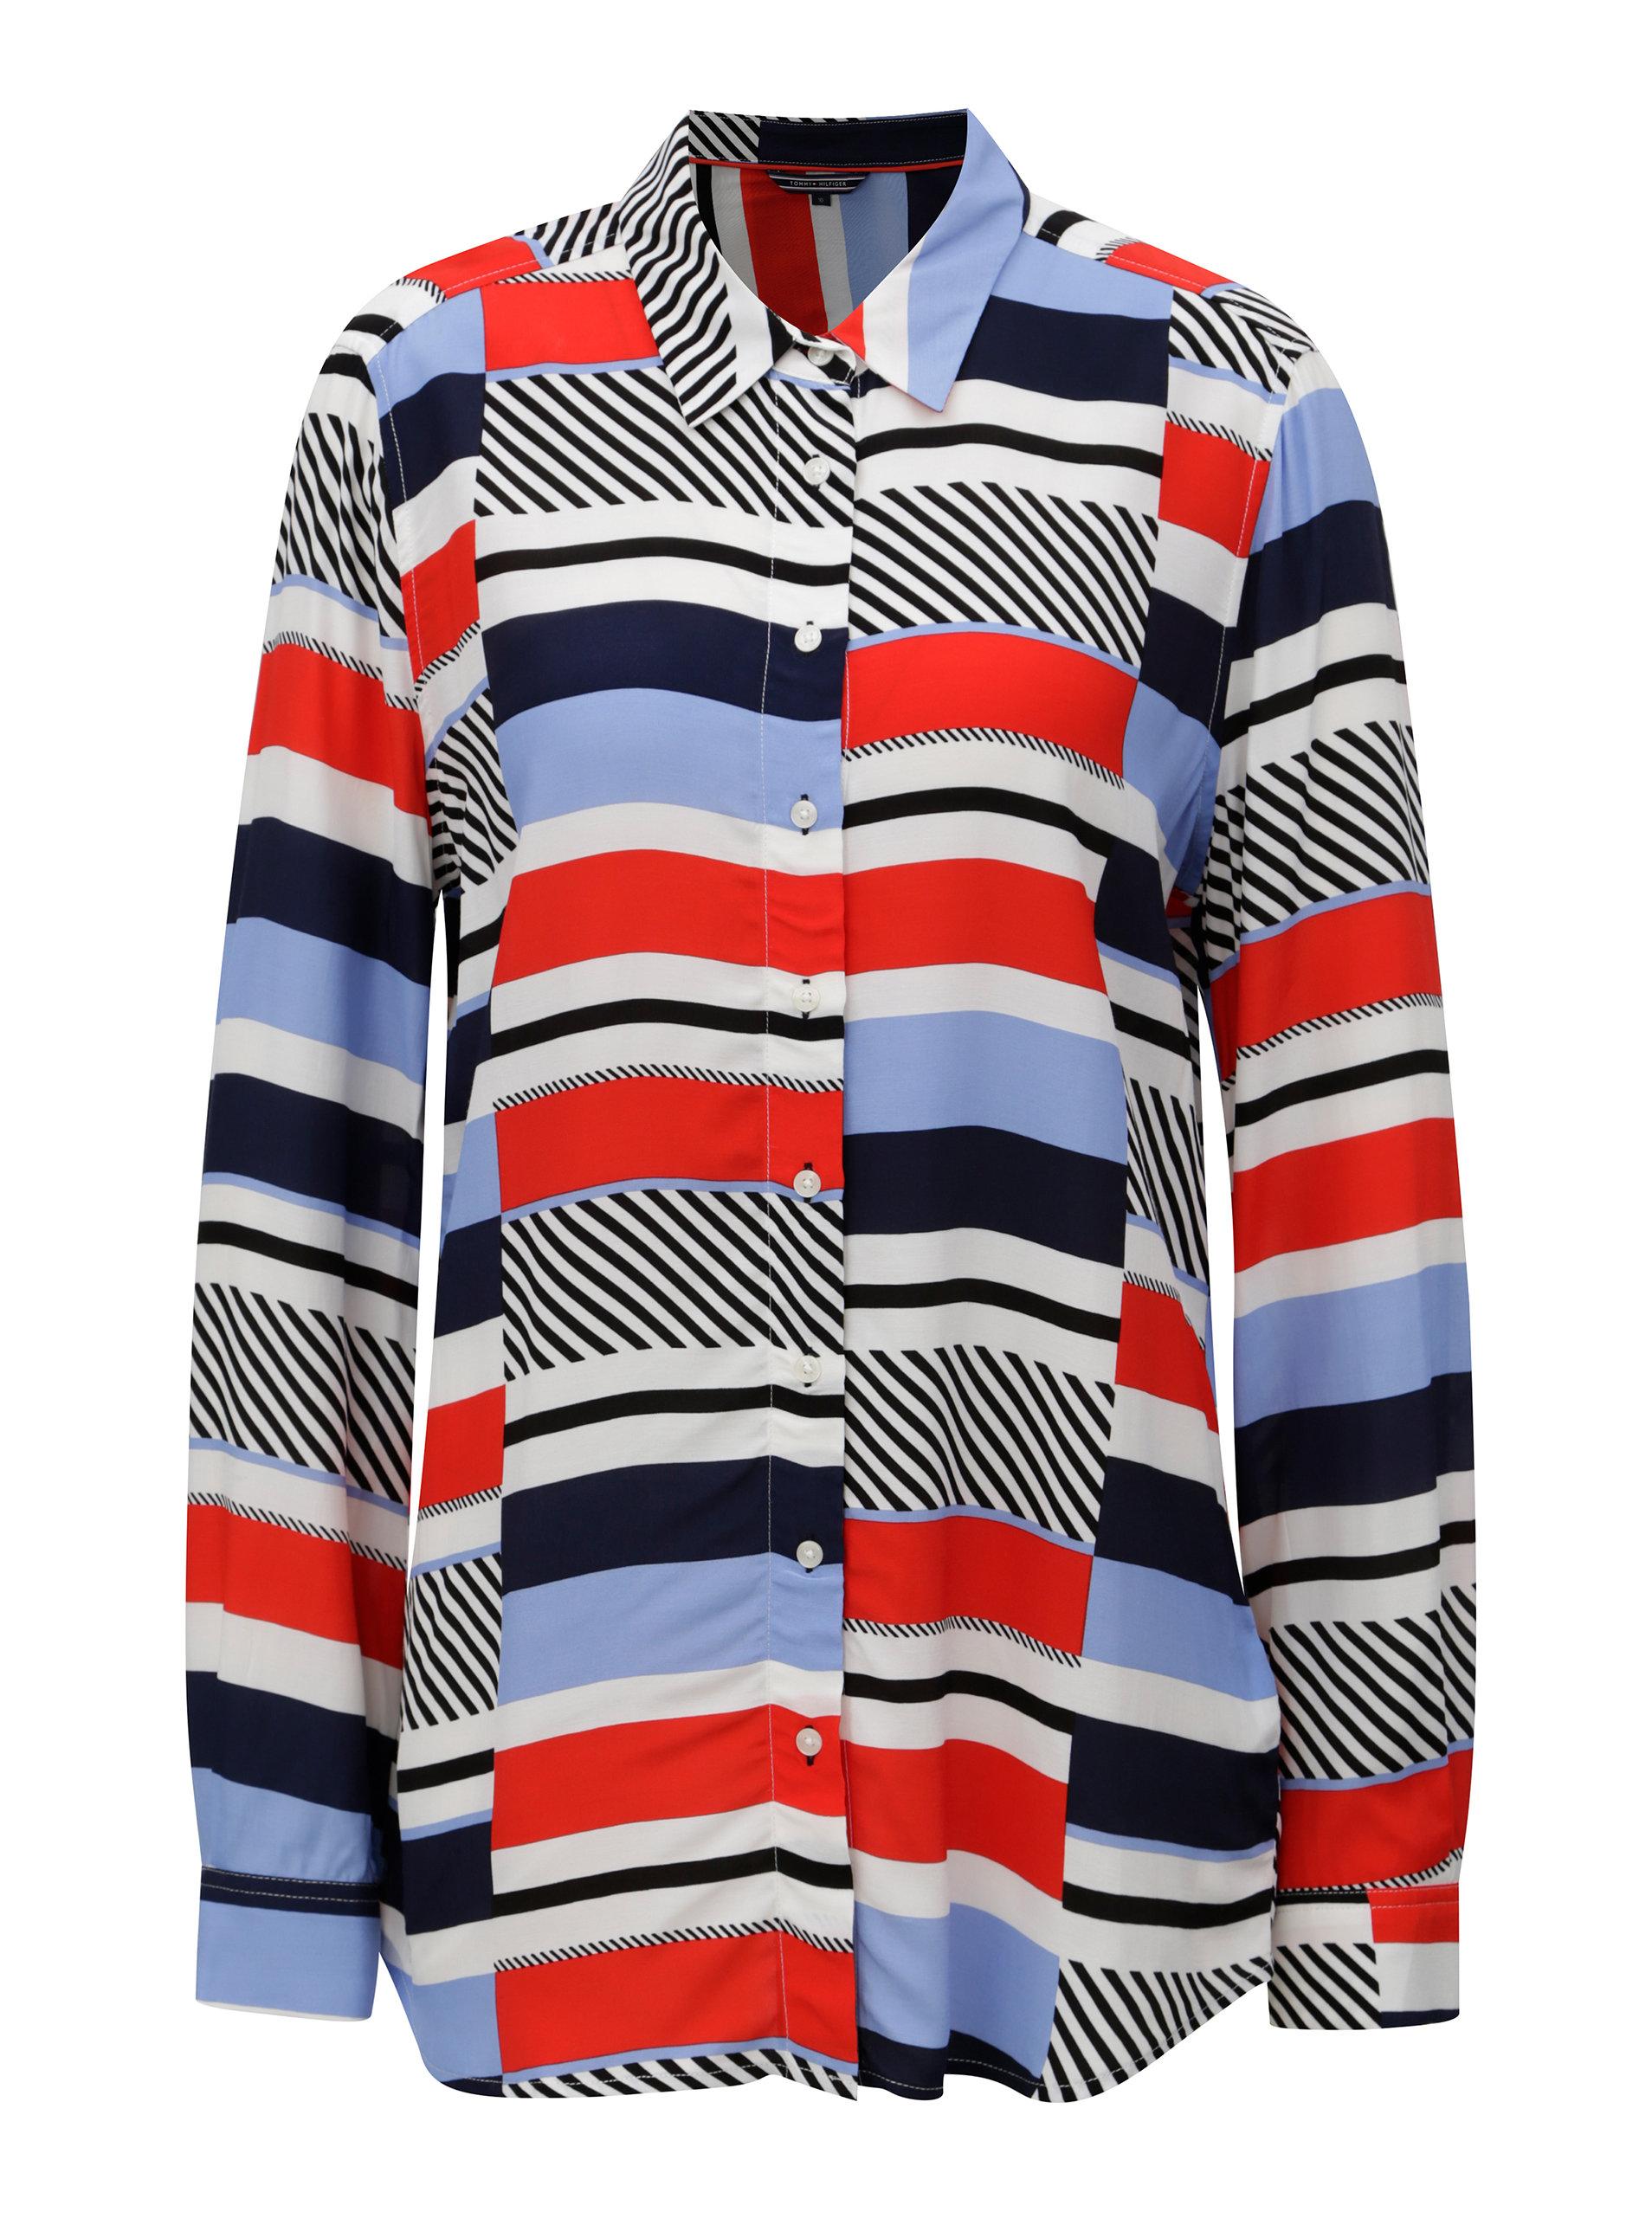 Červeno-modrá dámska pruhovaná košeľa Tommy Hilfiger ... 24de8c27fdb